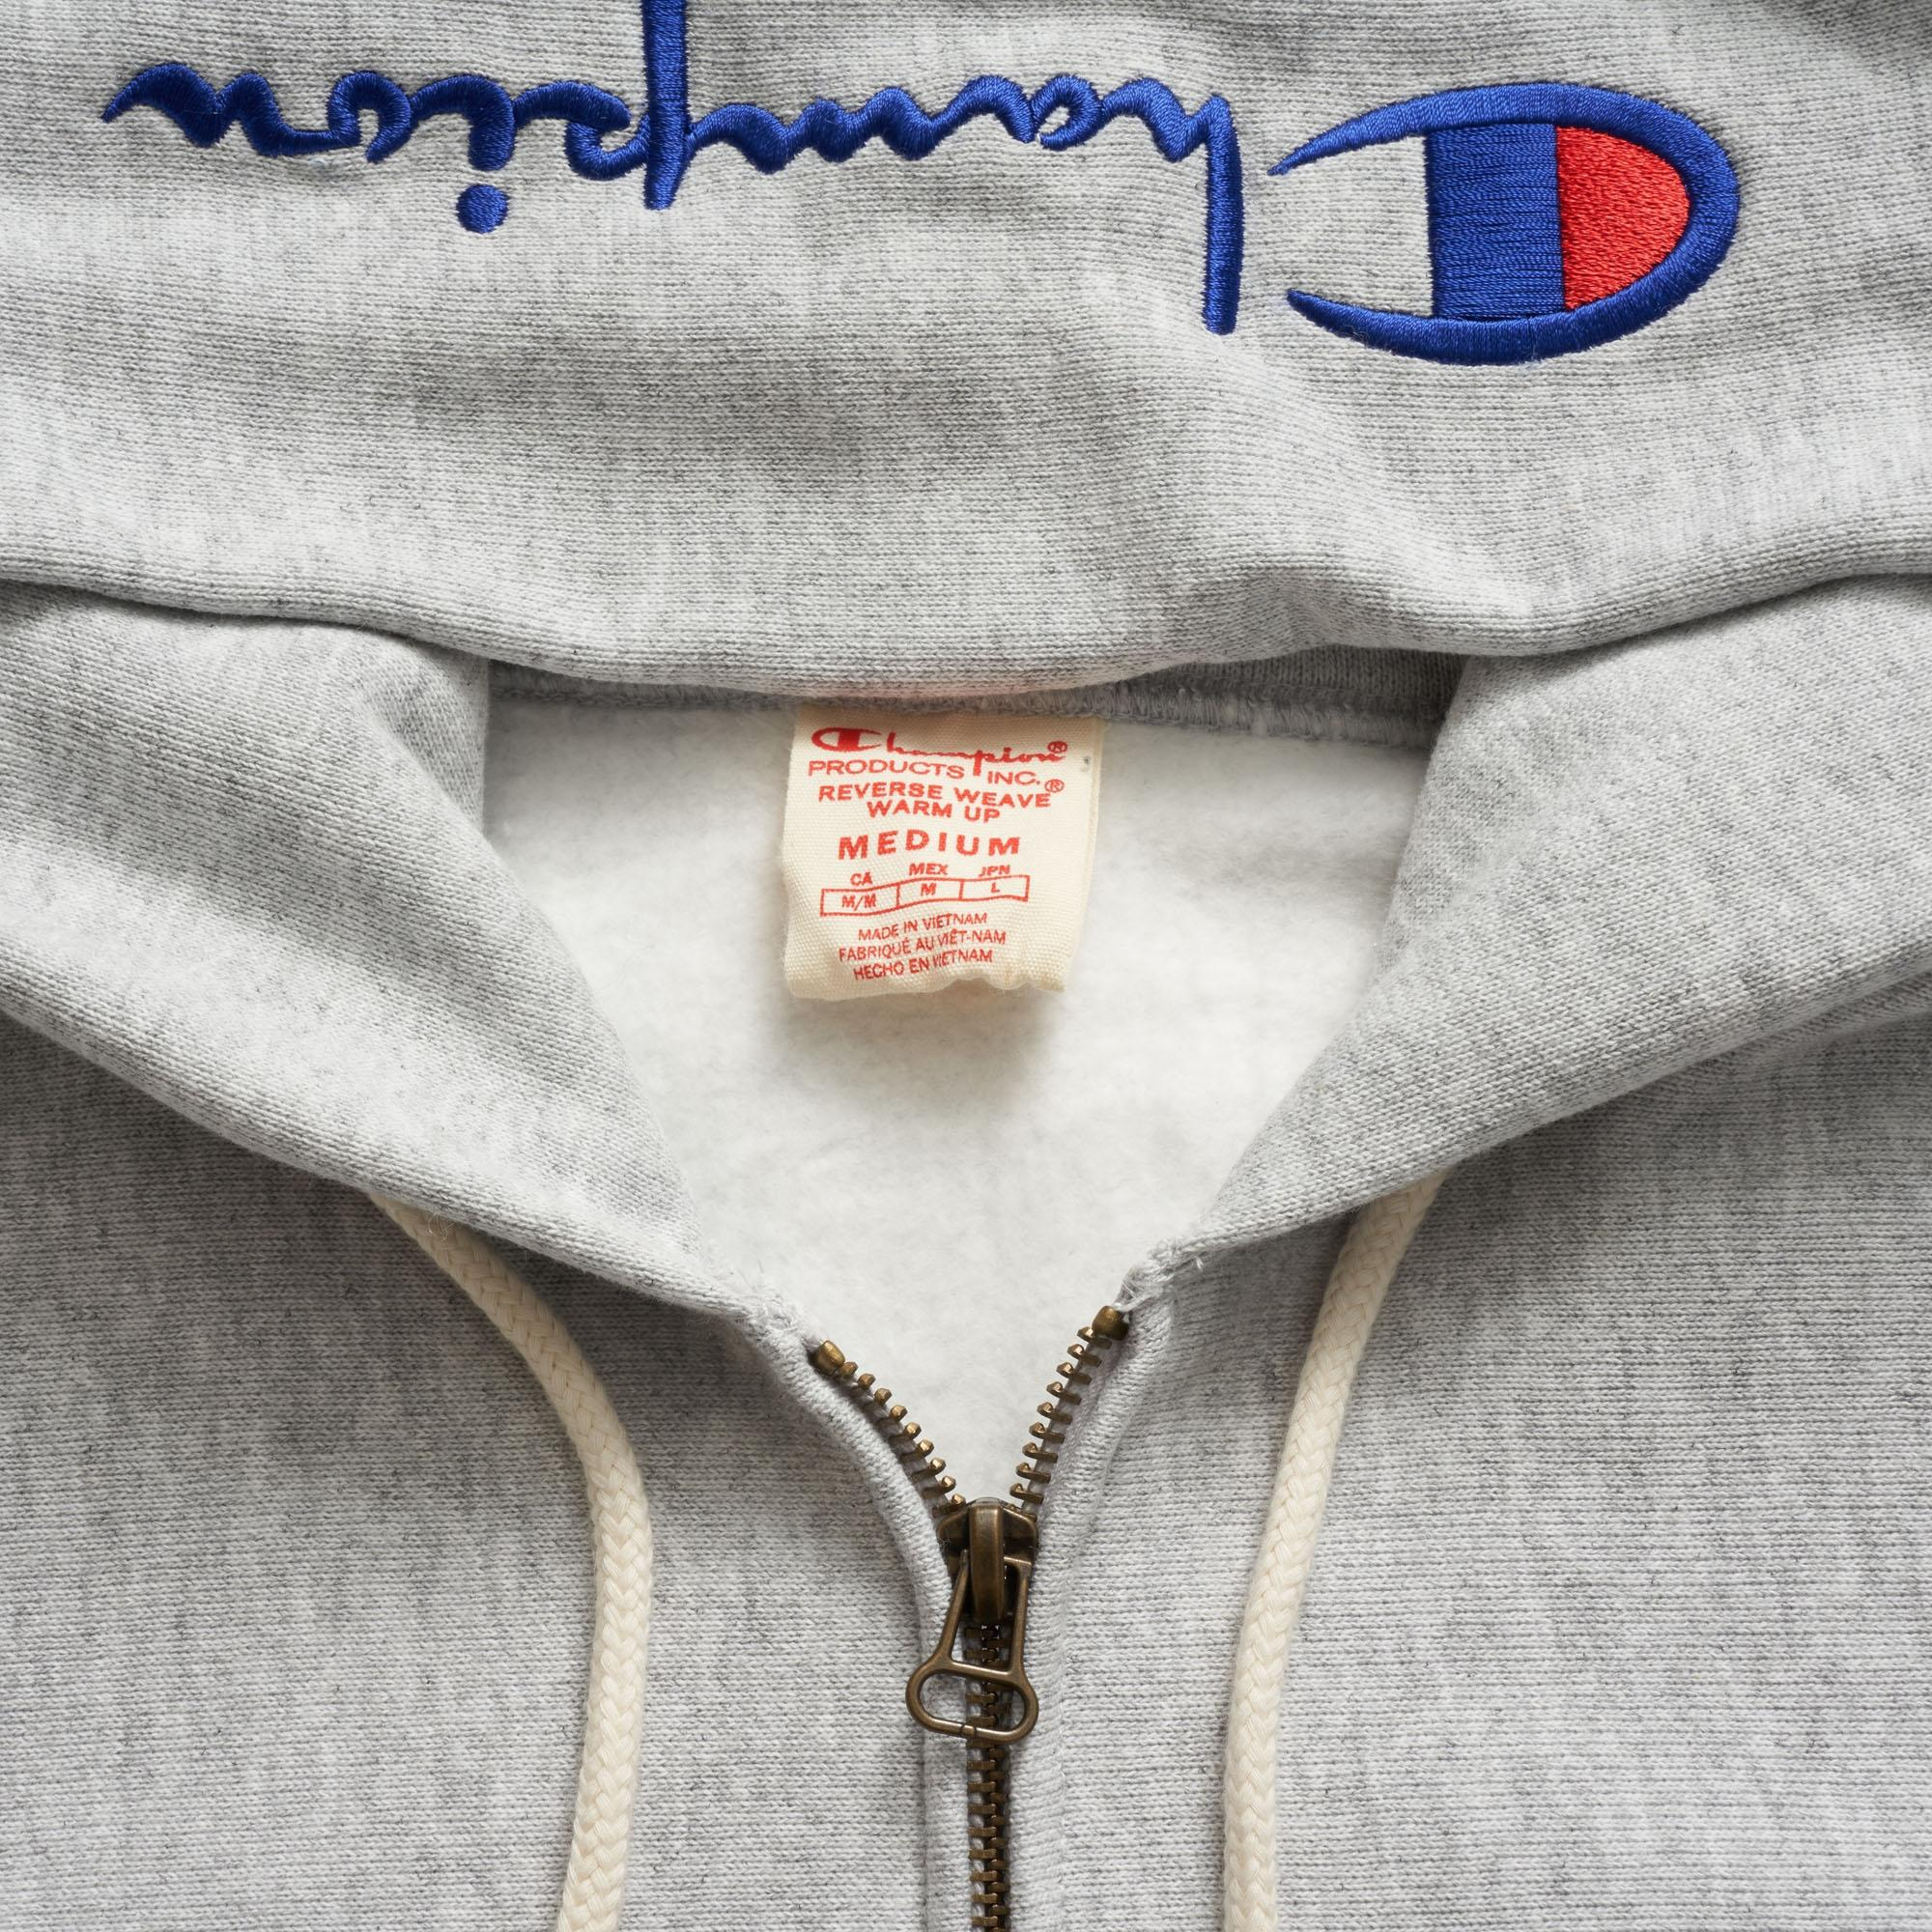 Weave Raveitsafe Champion Reverse Warm Sweatshirt Up v7Yg6fby